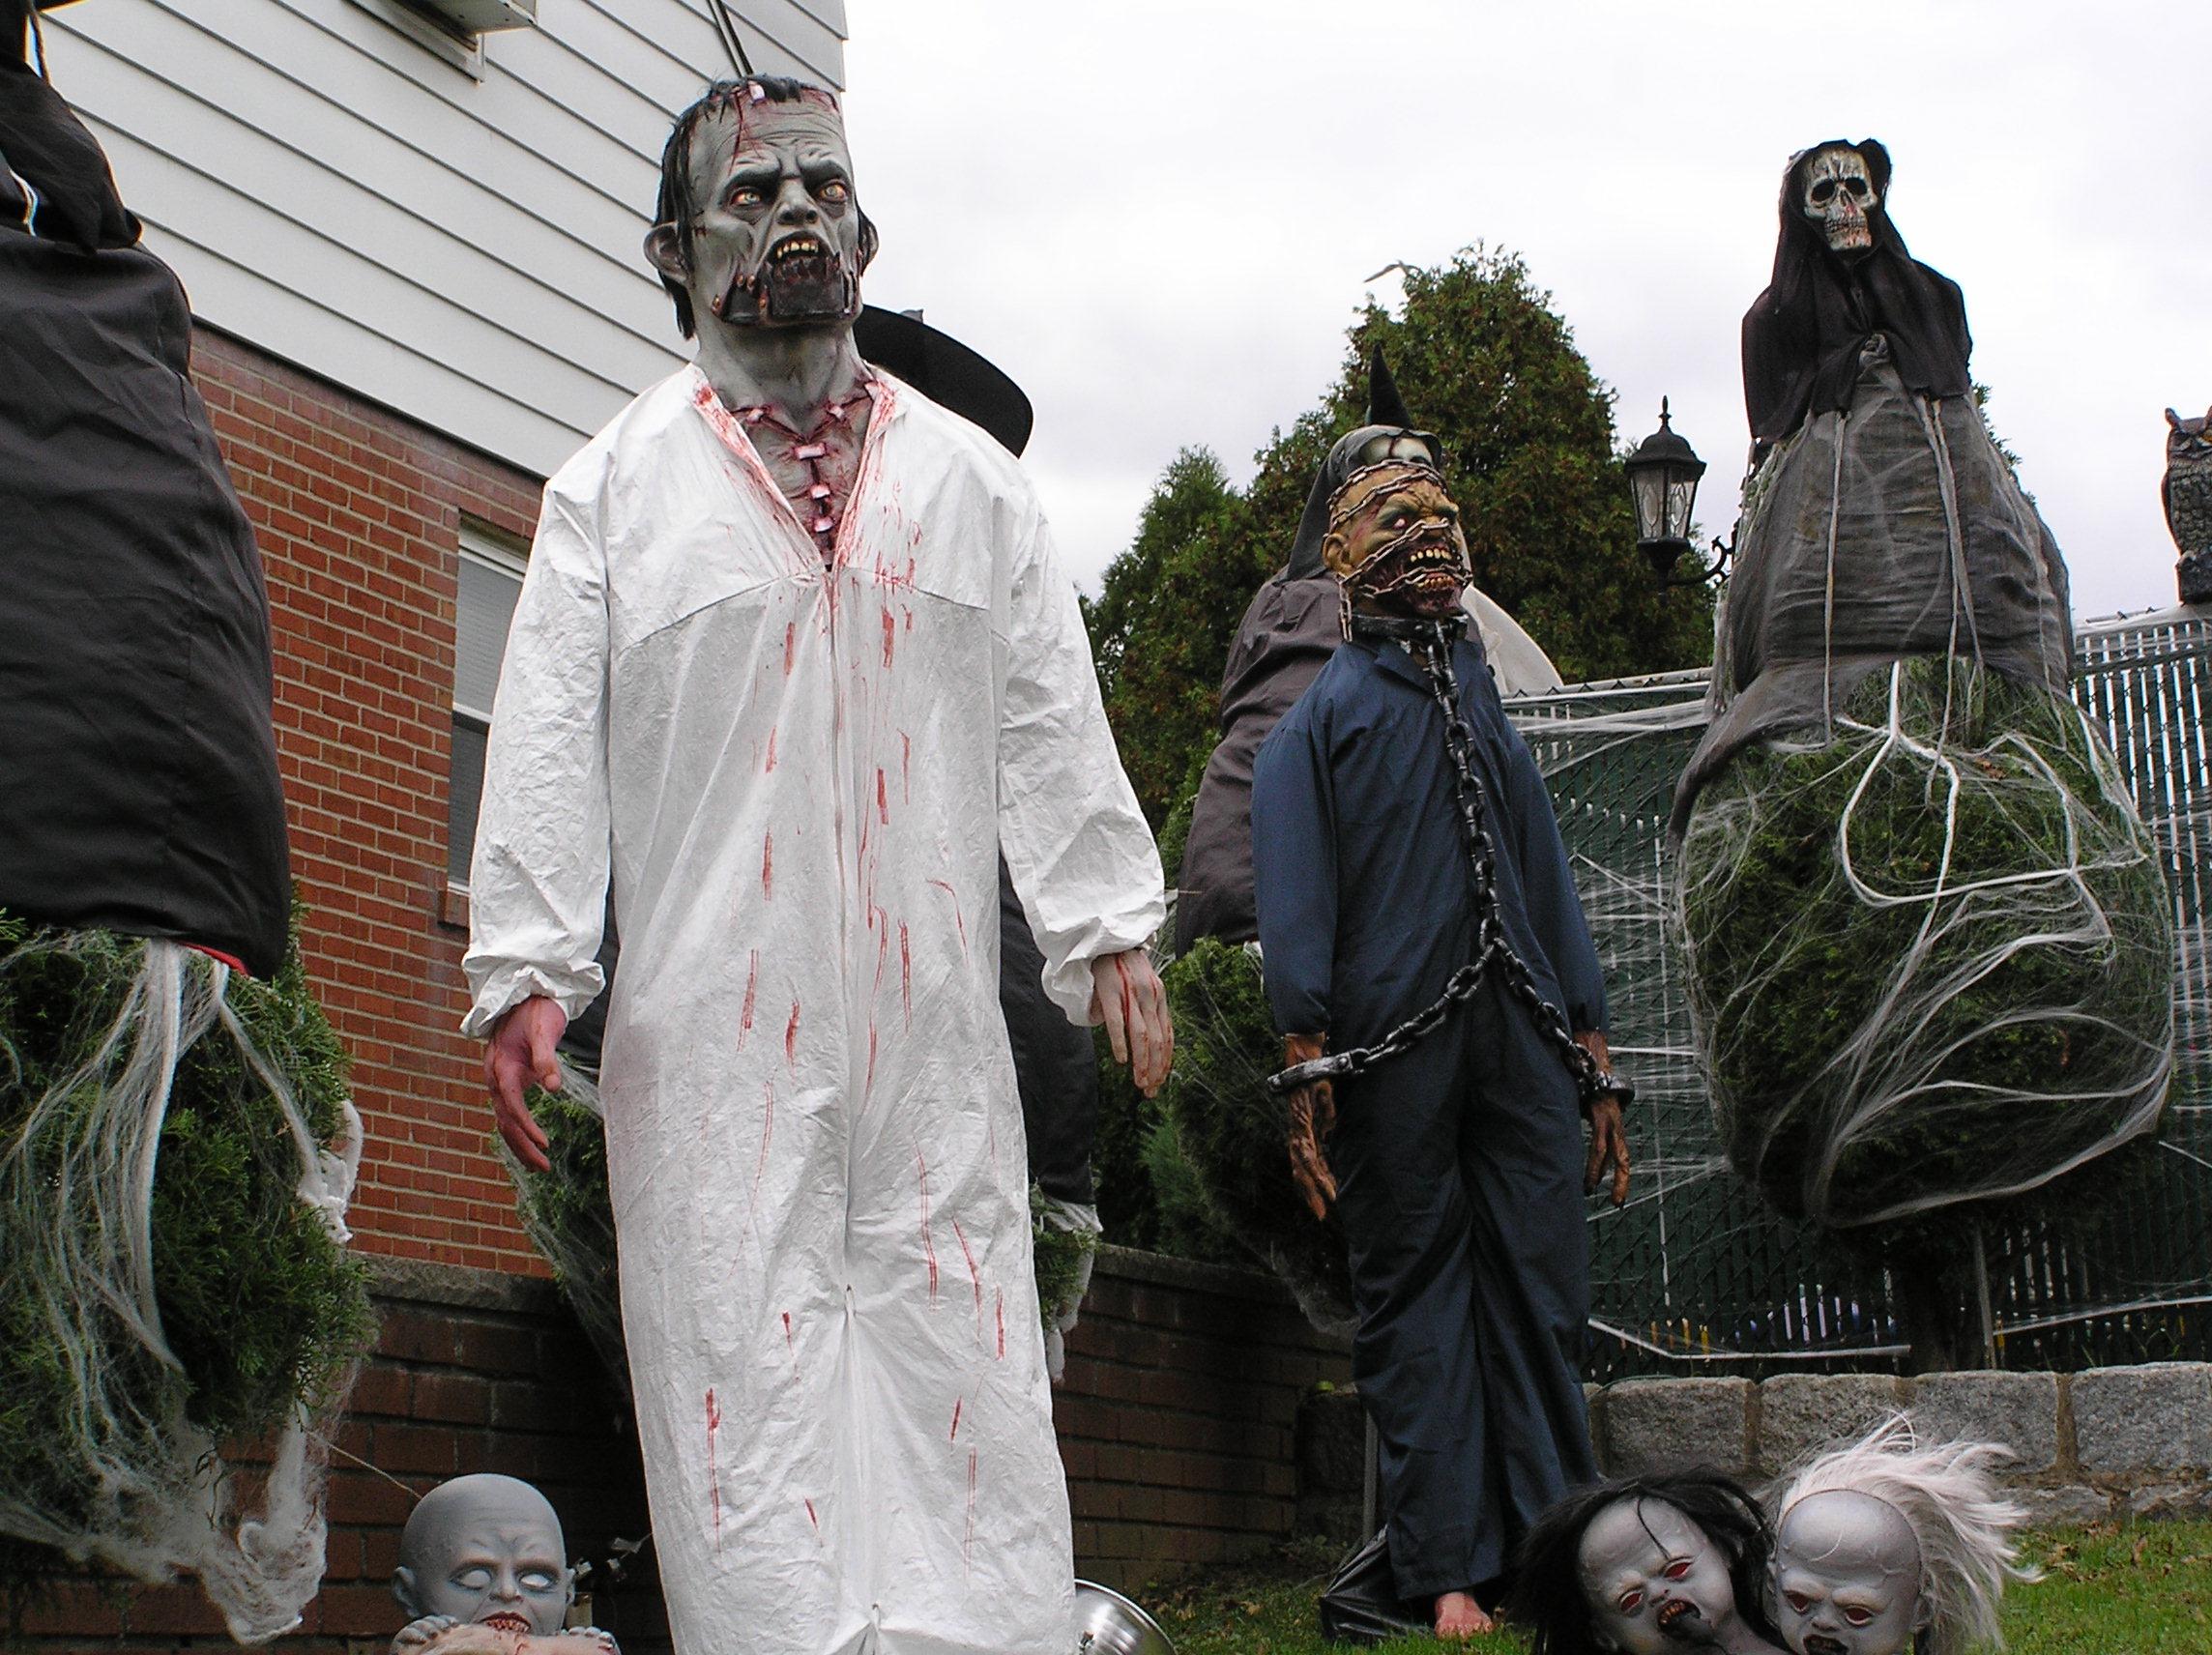 halloween costumes: